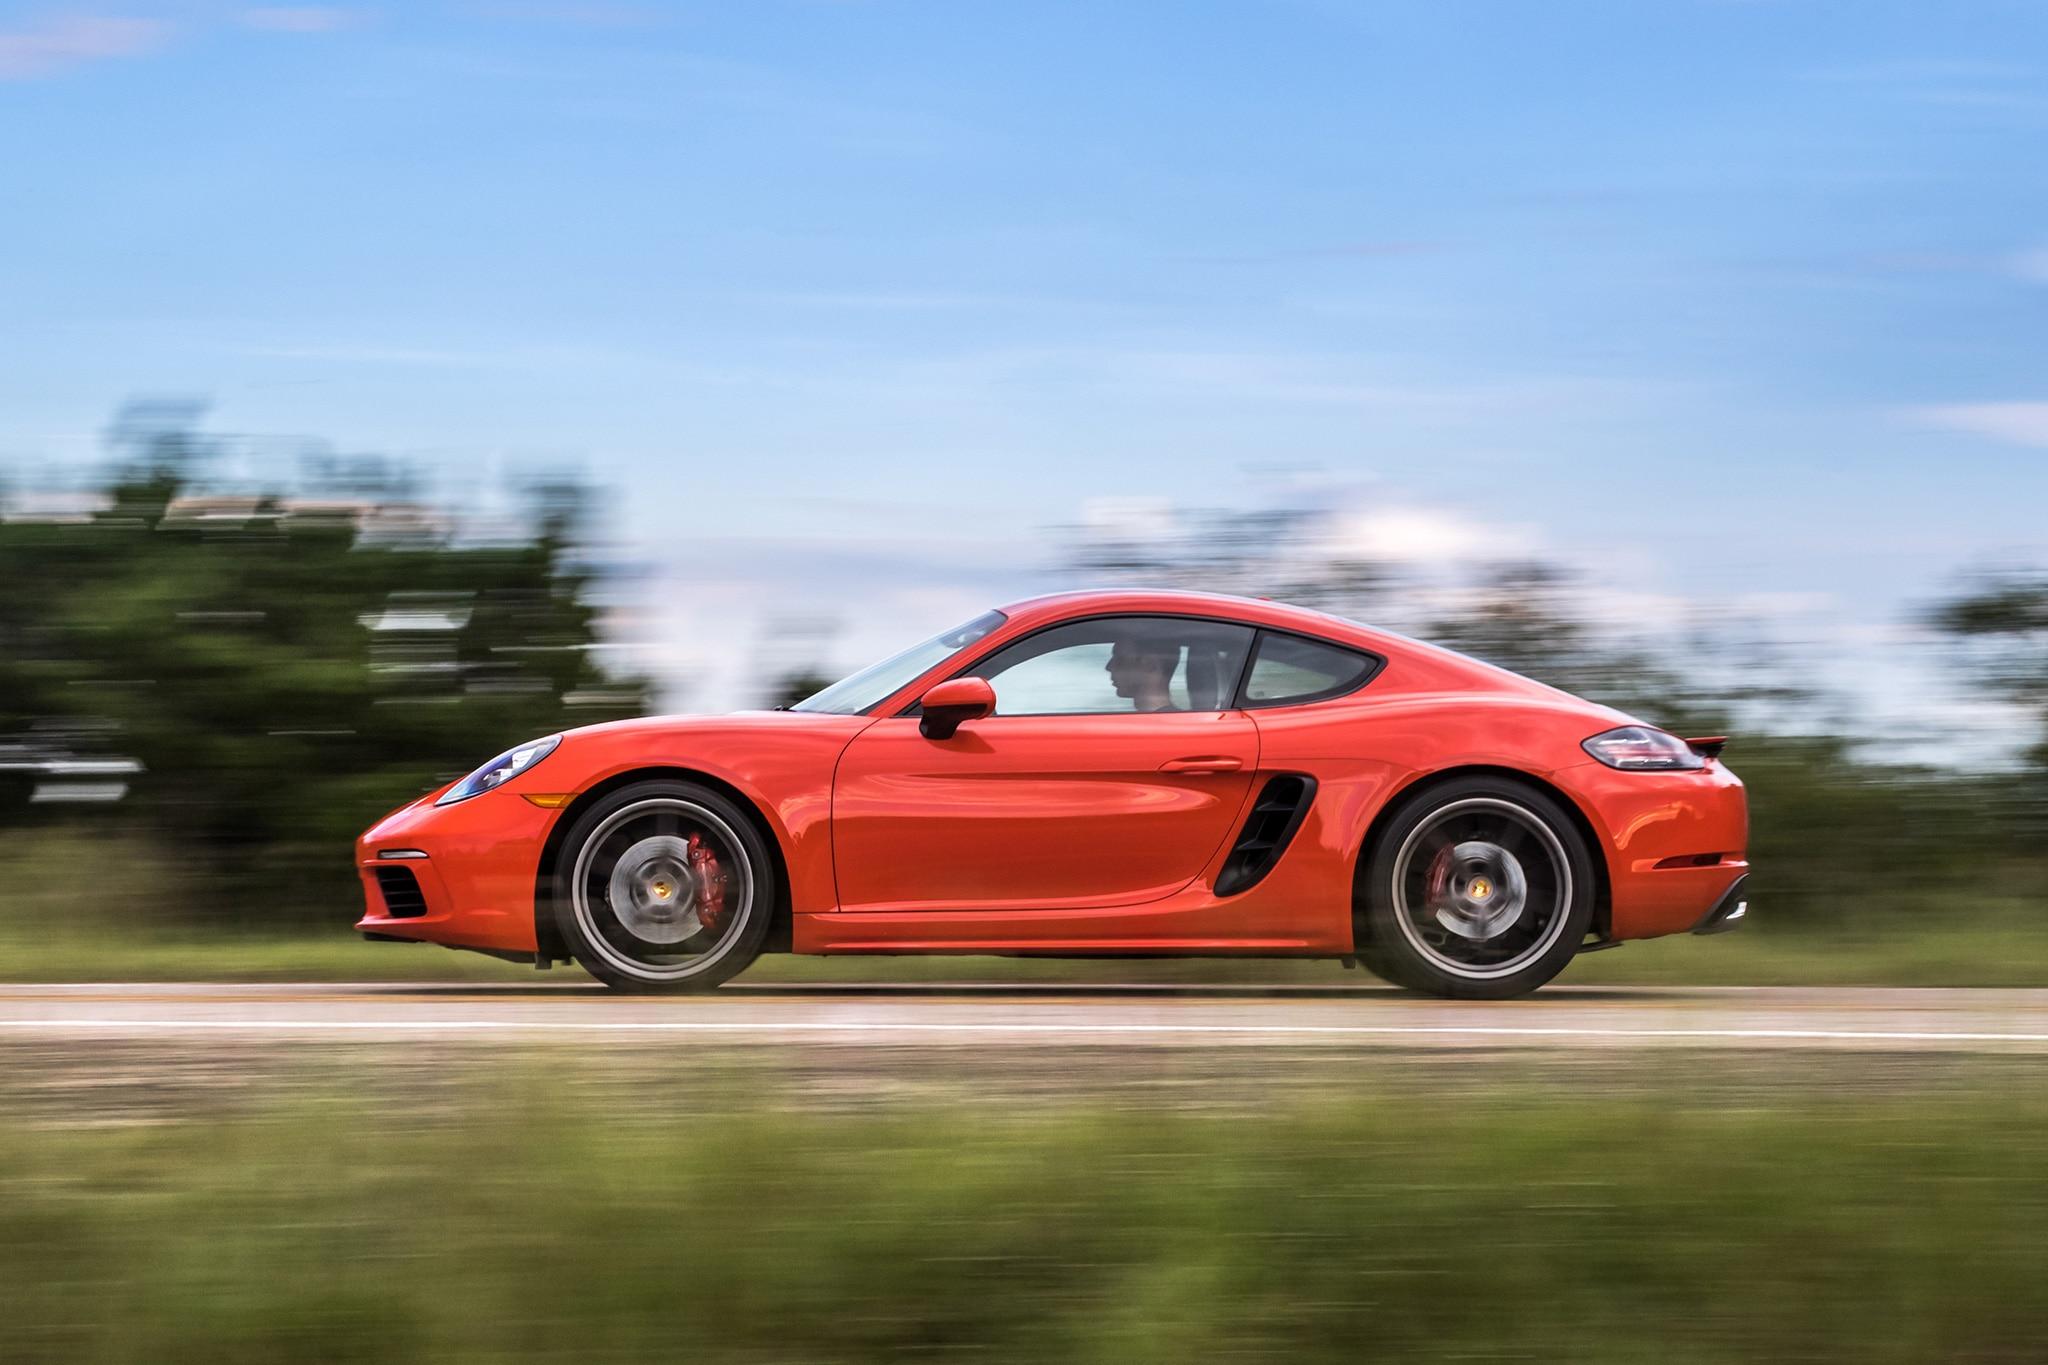 2017 Porsche 718 Cayman Side Profile In Motion